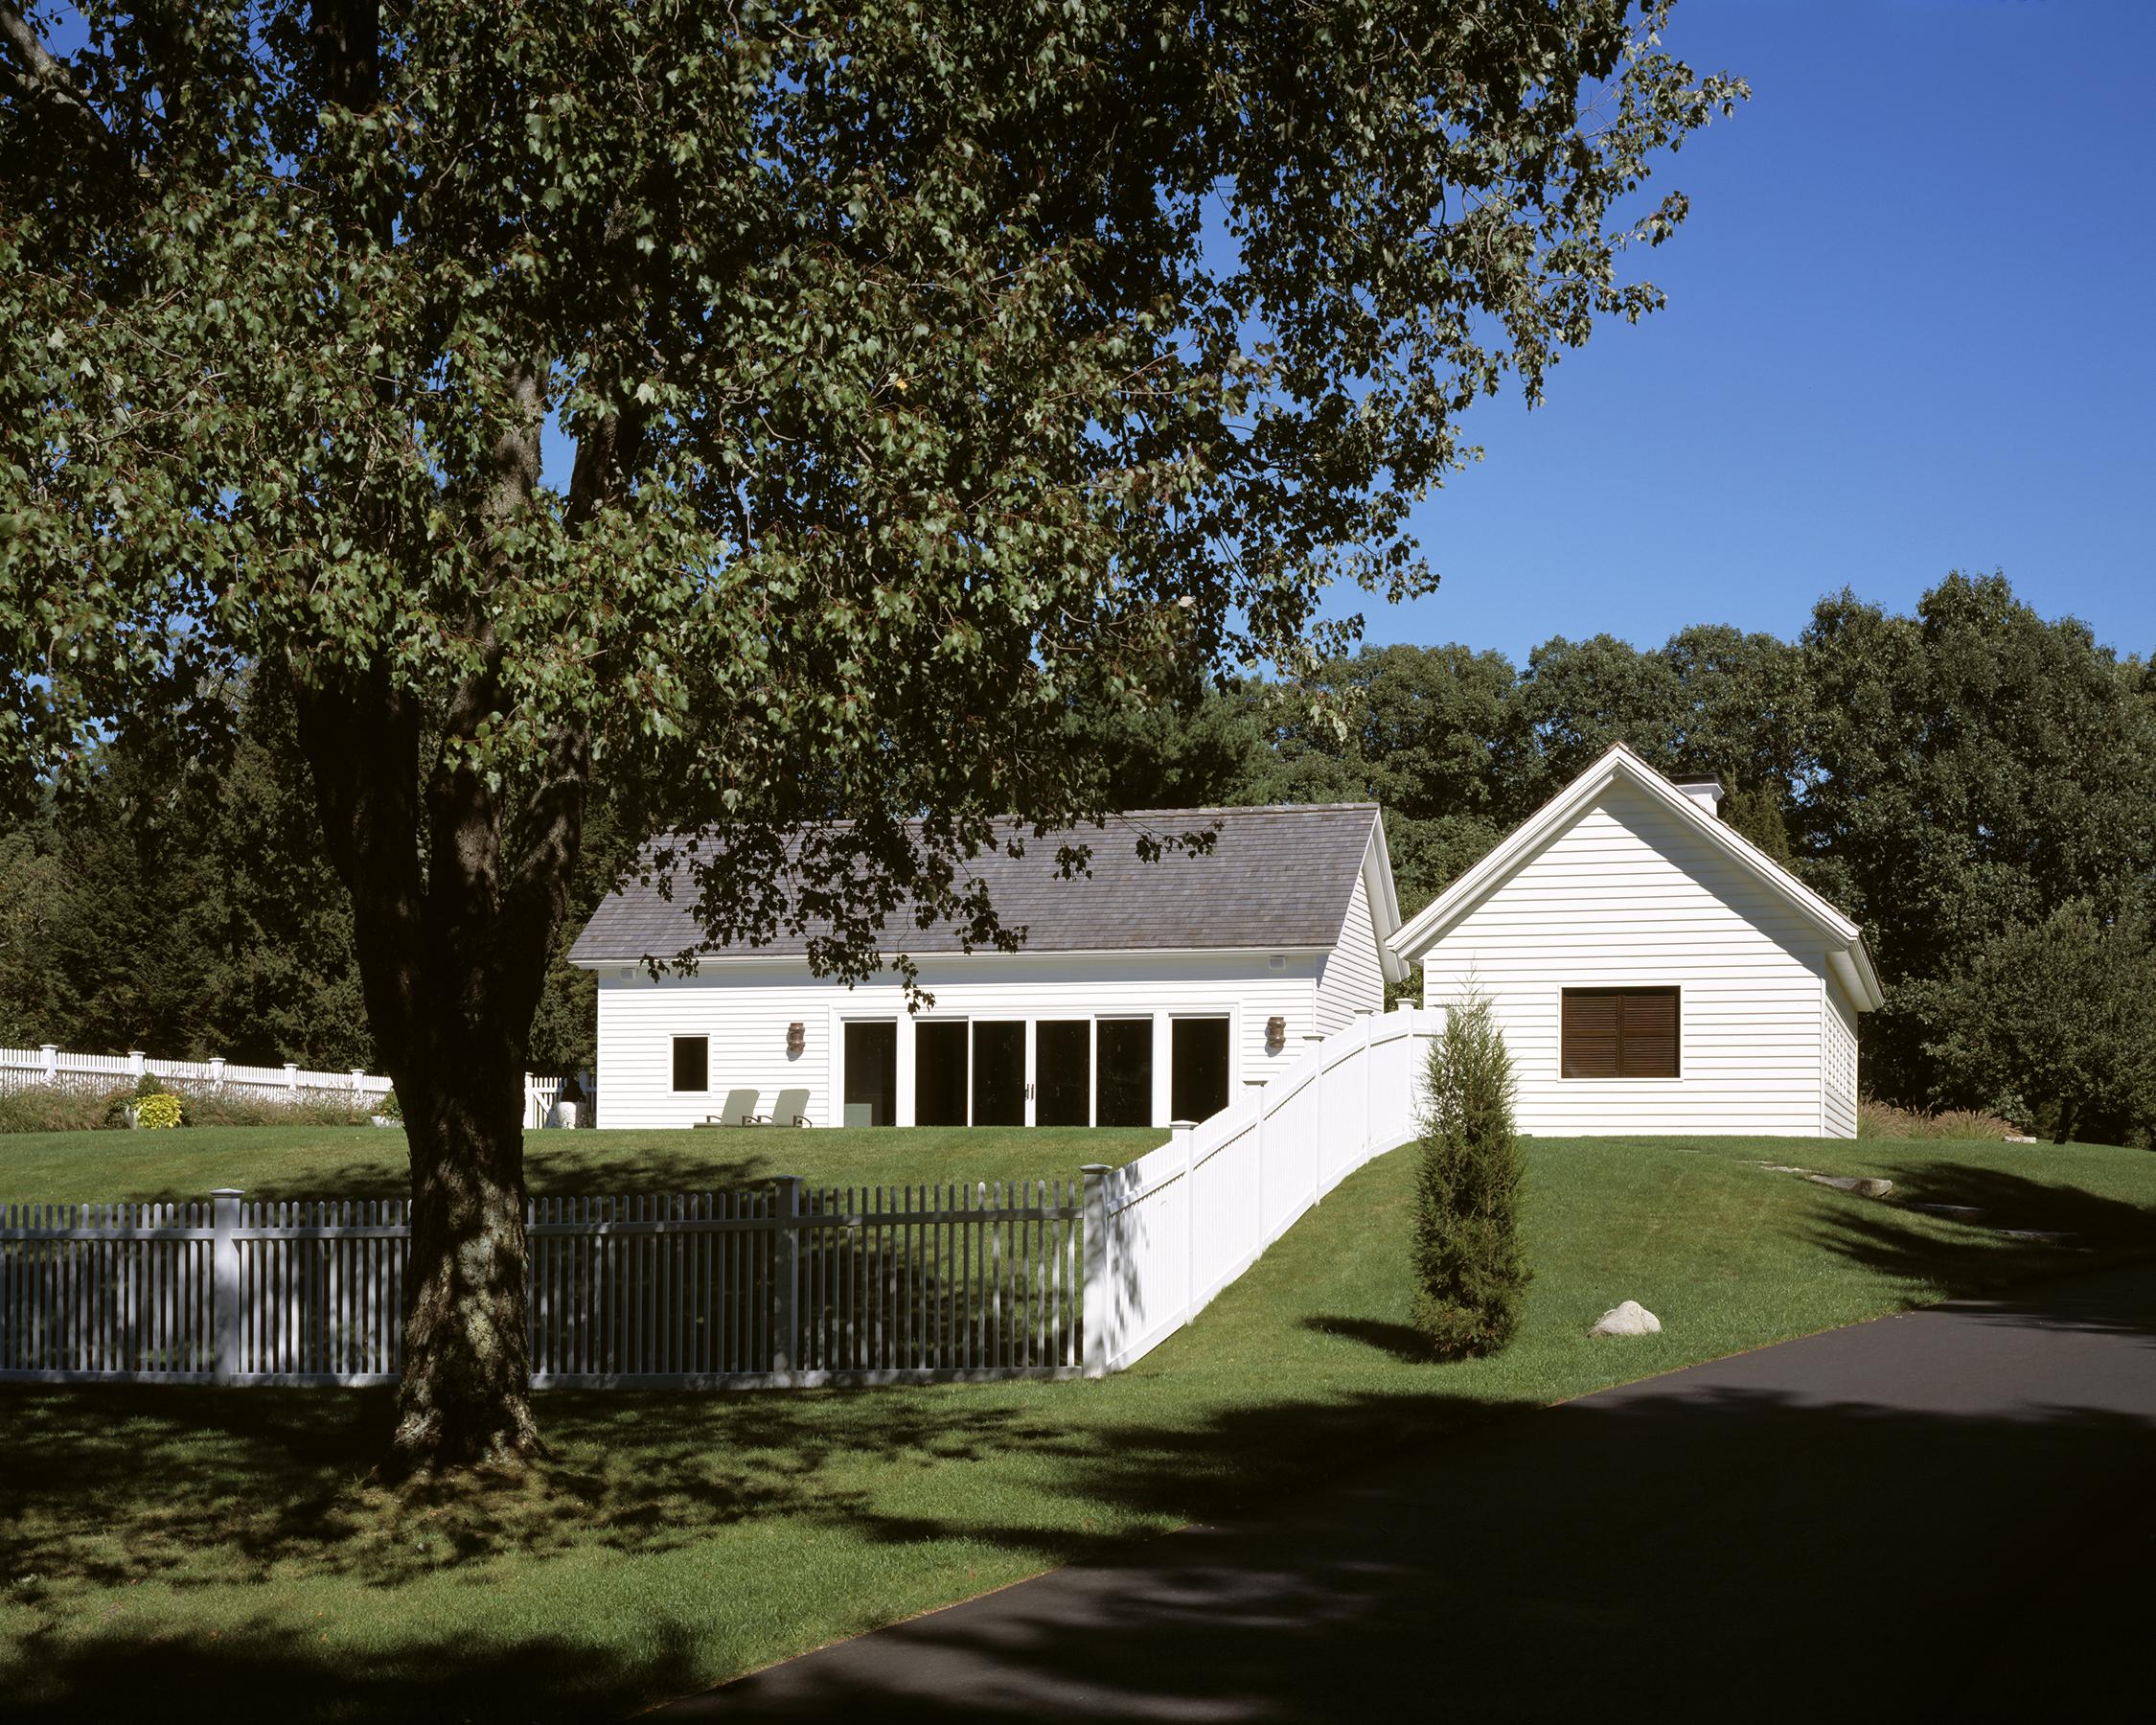 kennard architects - 090903_204.jpg